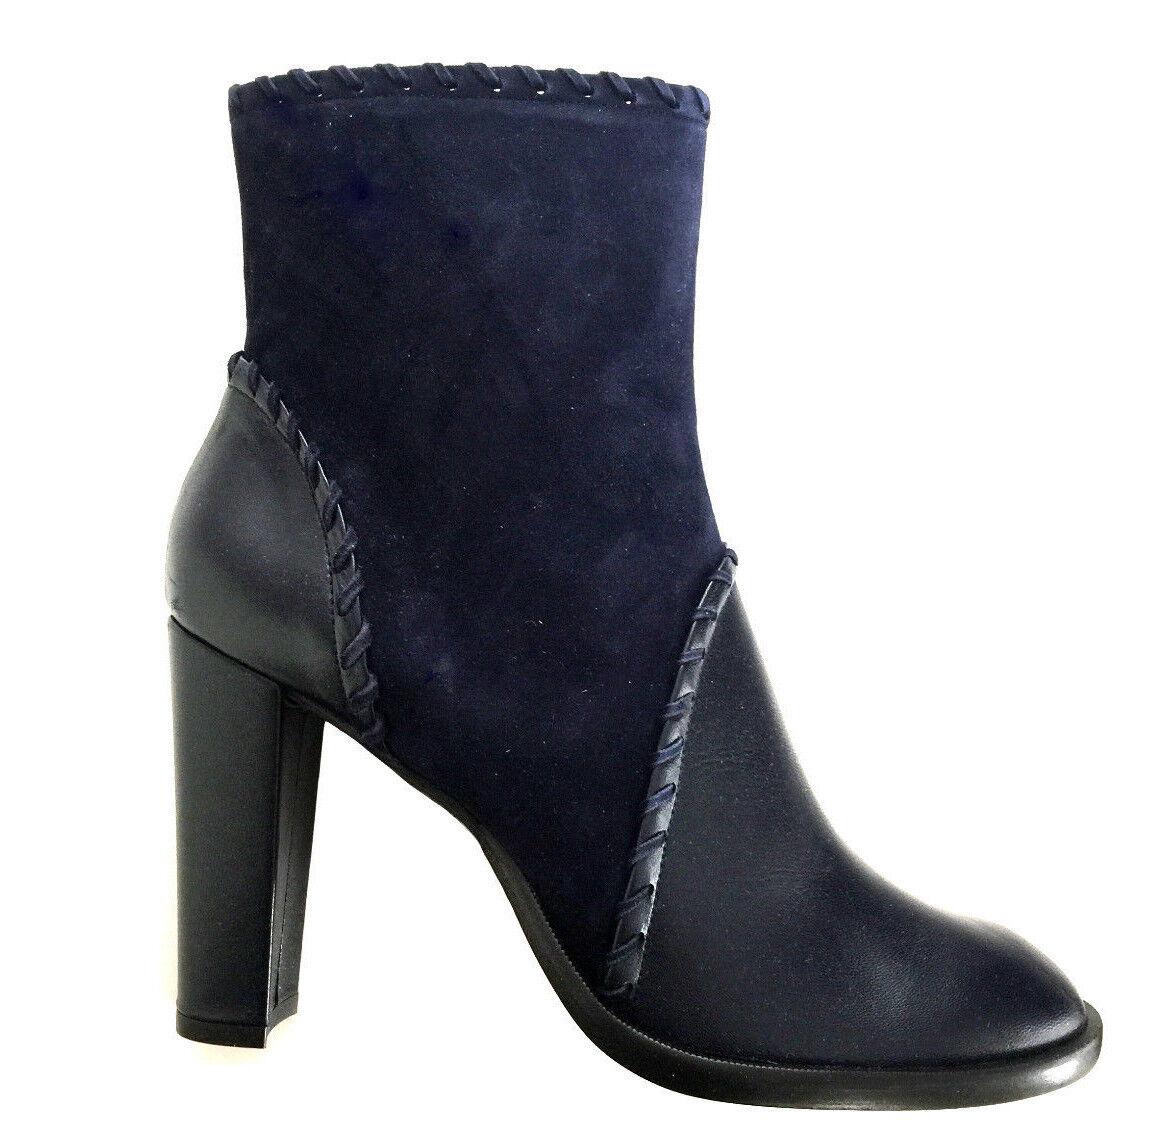 NEU Damenmode Damen Schuhe Stiefeletten dunkelblau  Gr.40 v.Carrierre Design